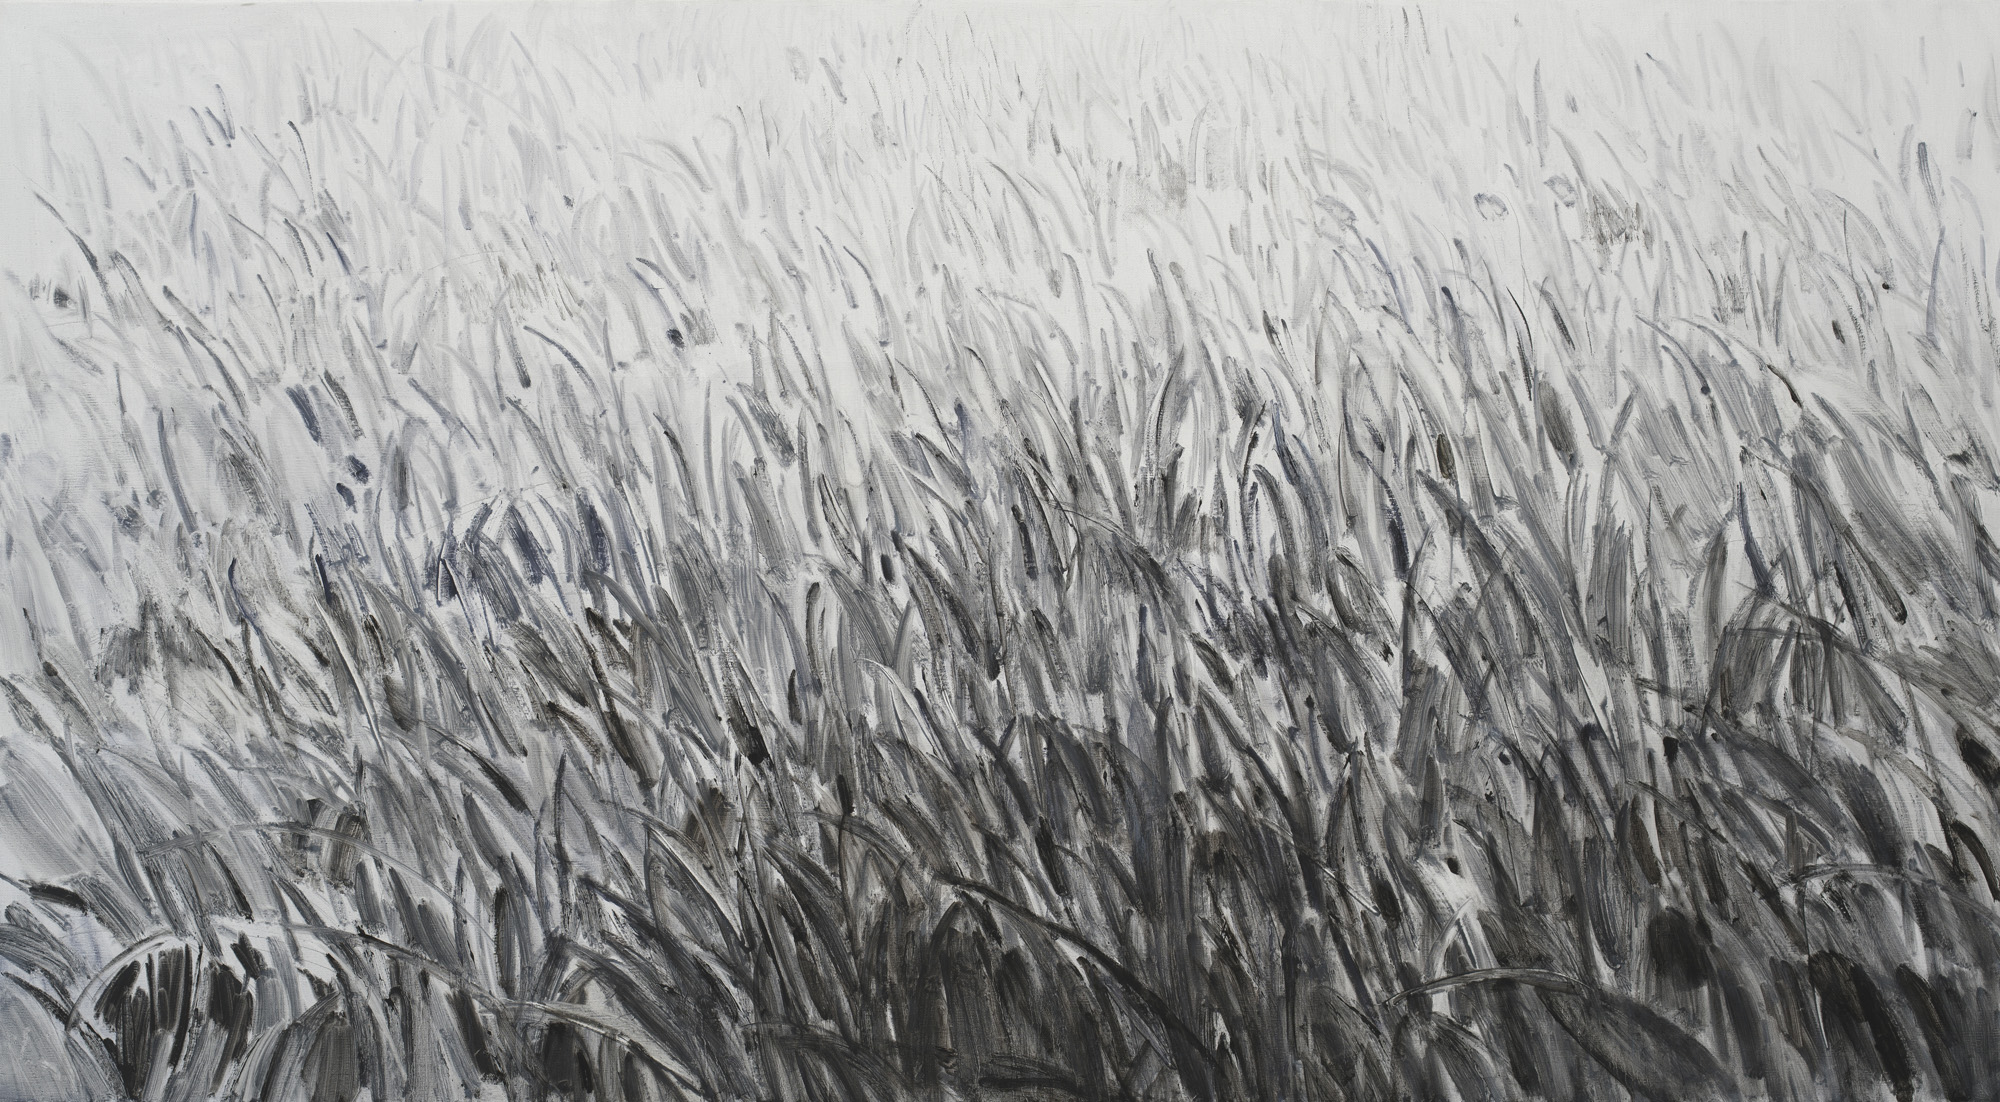 Shi Zhiying   Grass , 2018 Oil on canvas 110 x 200 cm